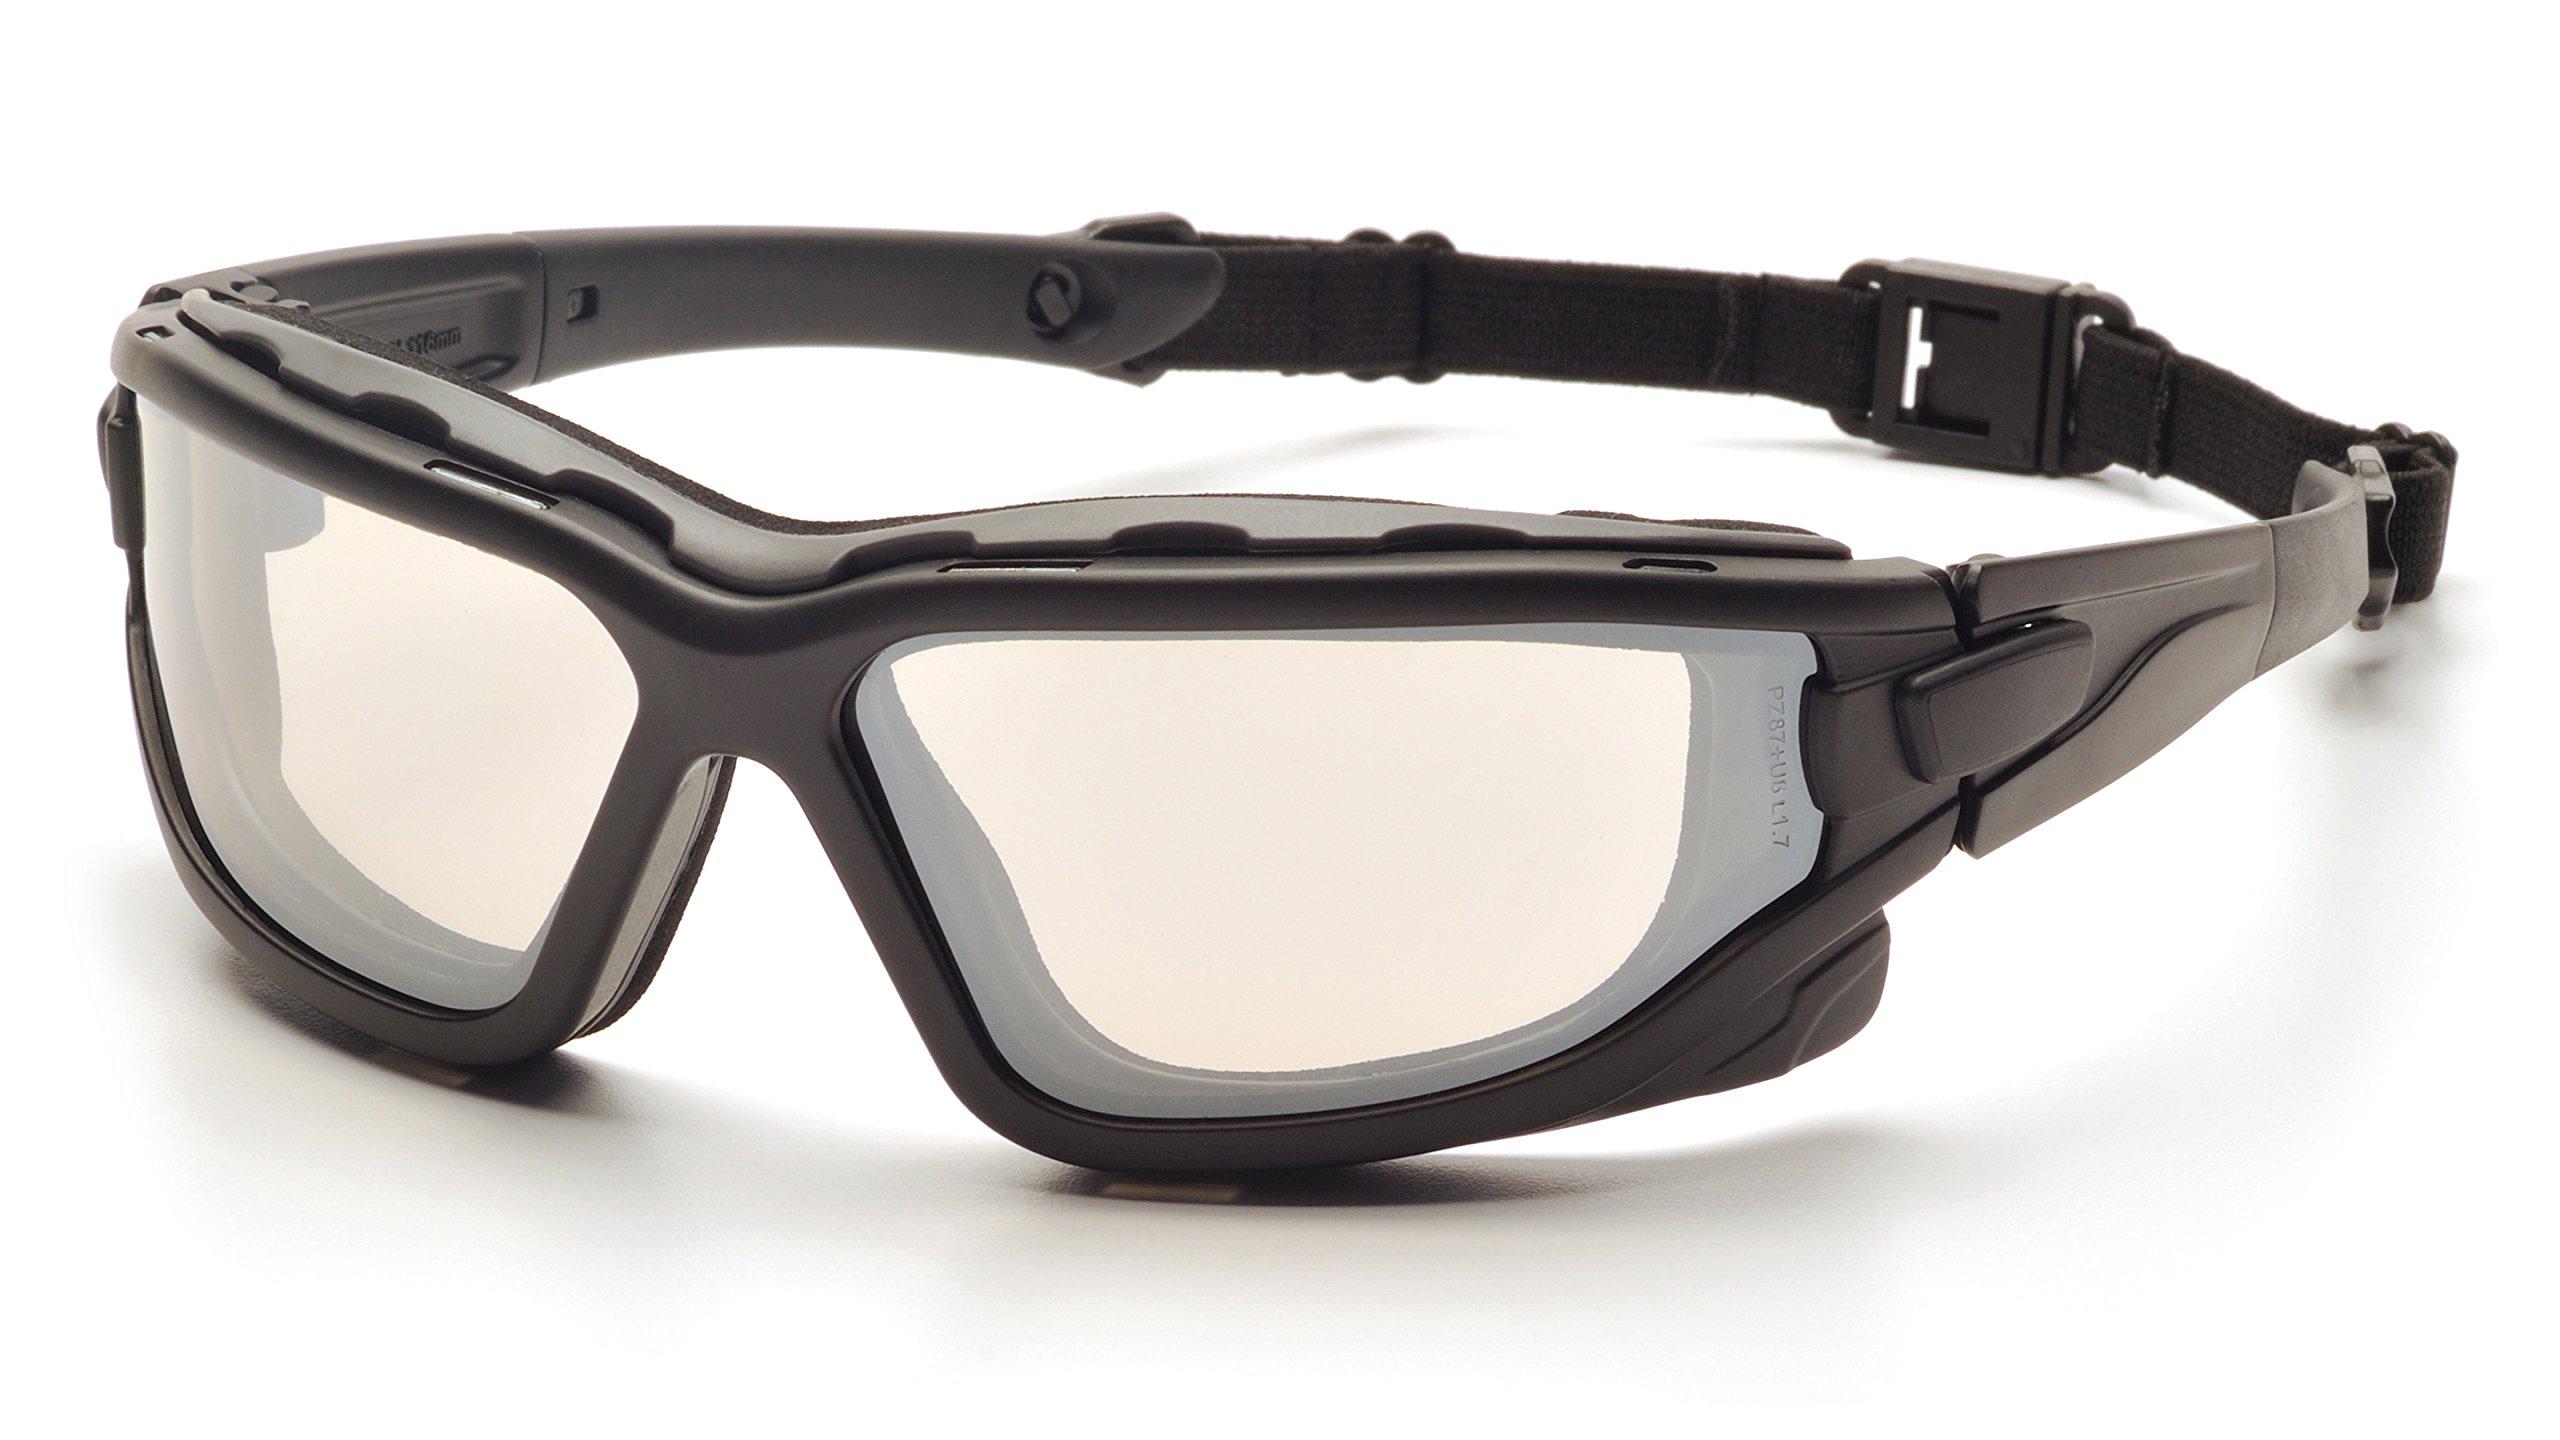 Pyramex I-Force Slim Safety Goggle SB7080SDNT, Black Frame/Indoor/Outdoor Mirror Anti-Fog Lens